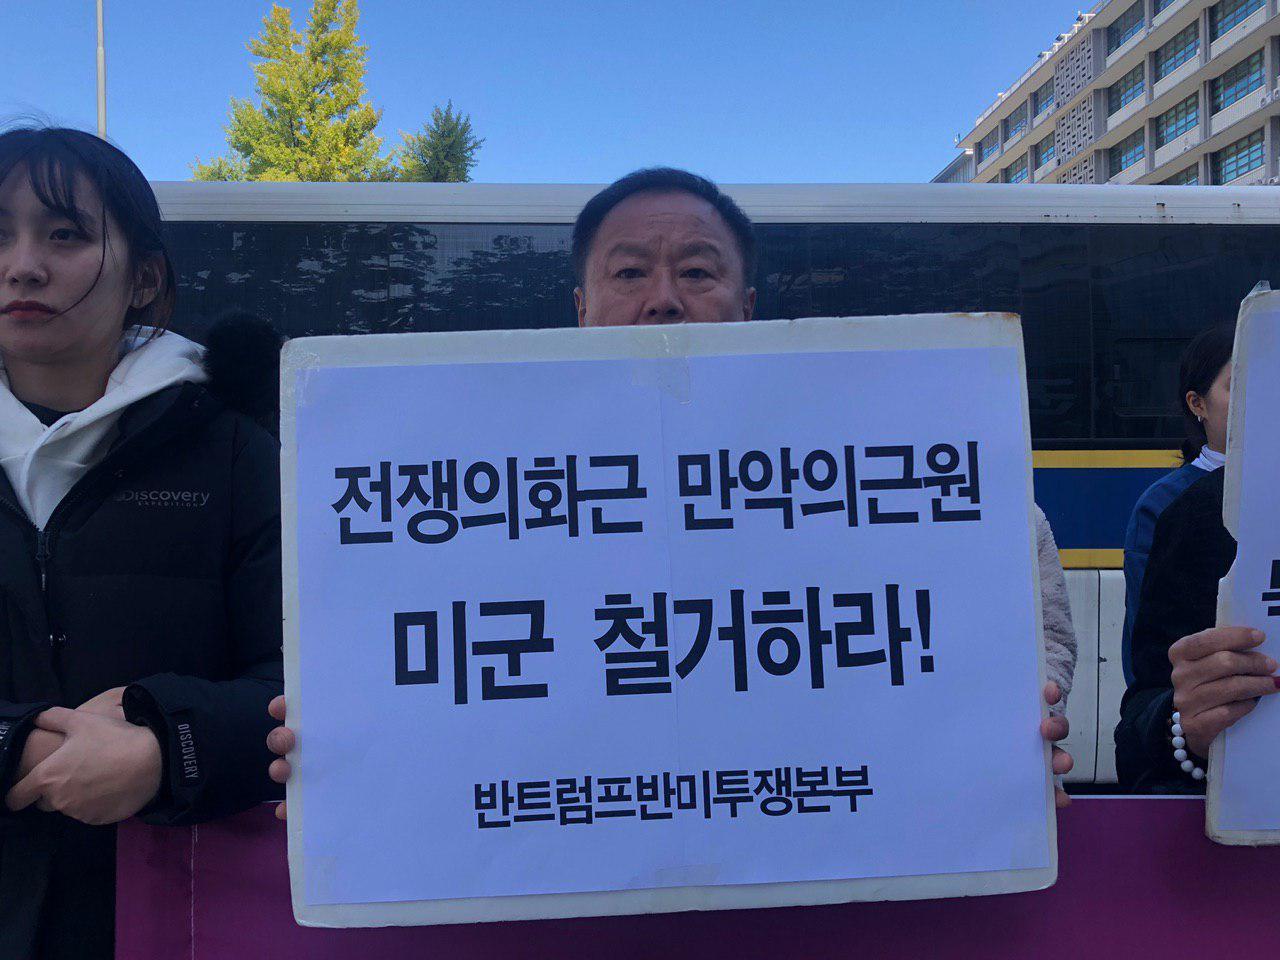 photo_2019-10-12_04-12-22.jpg